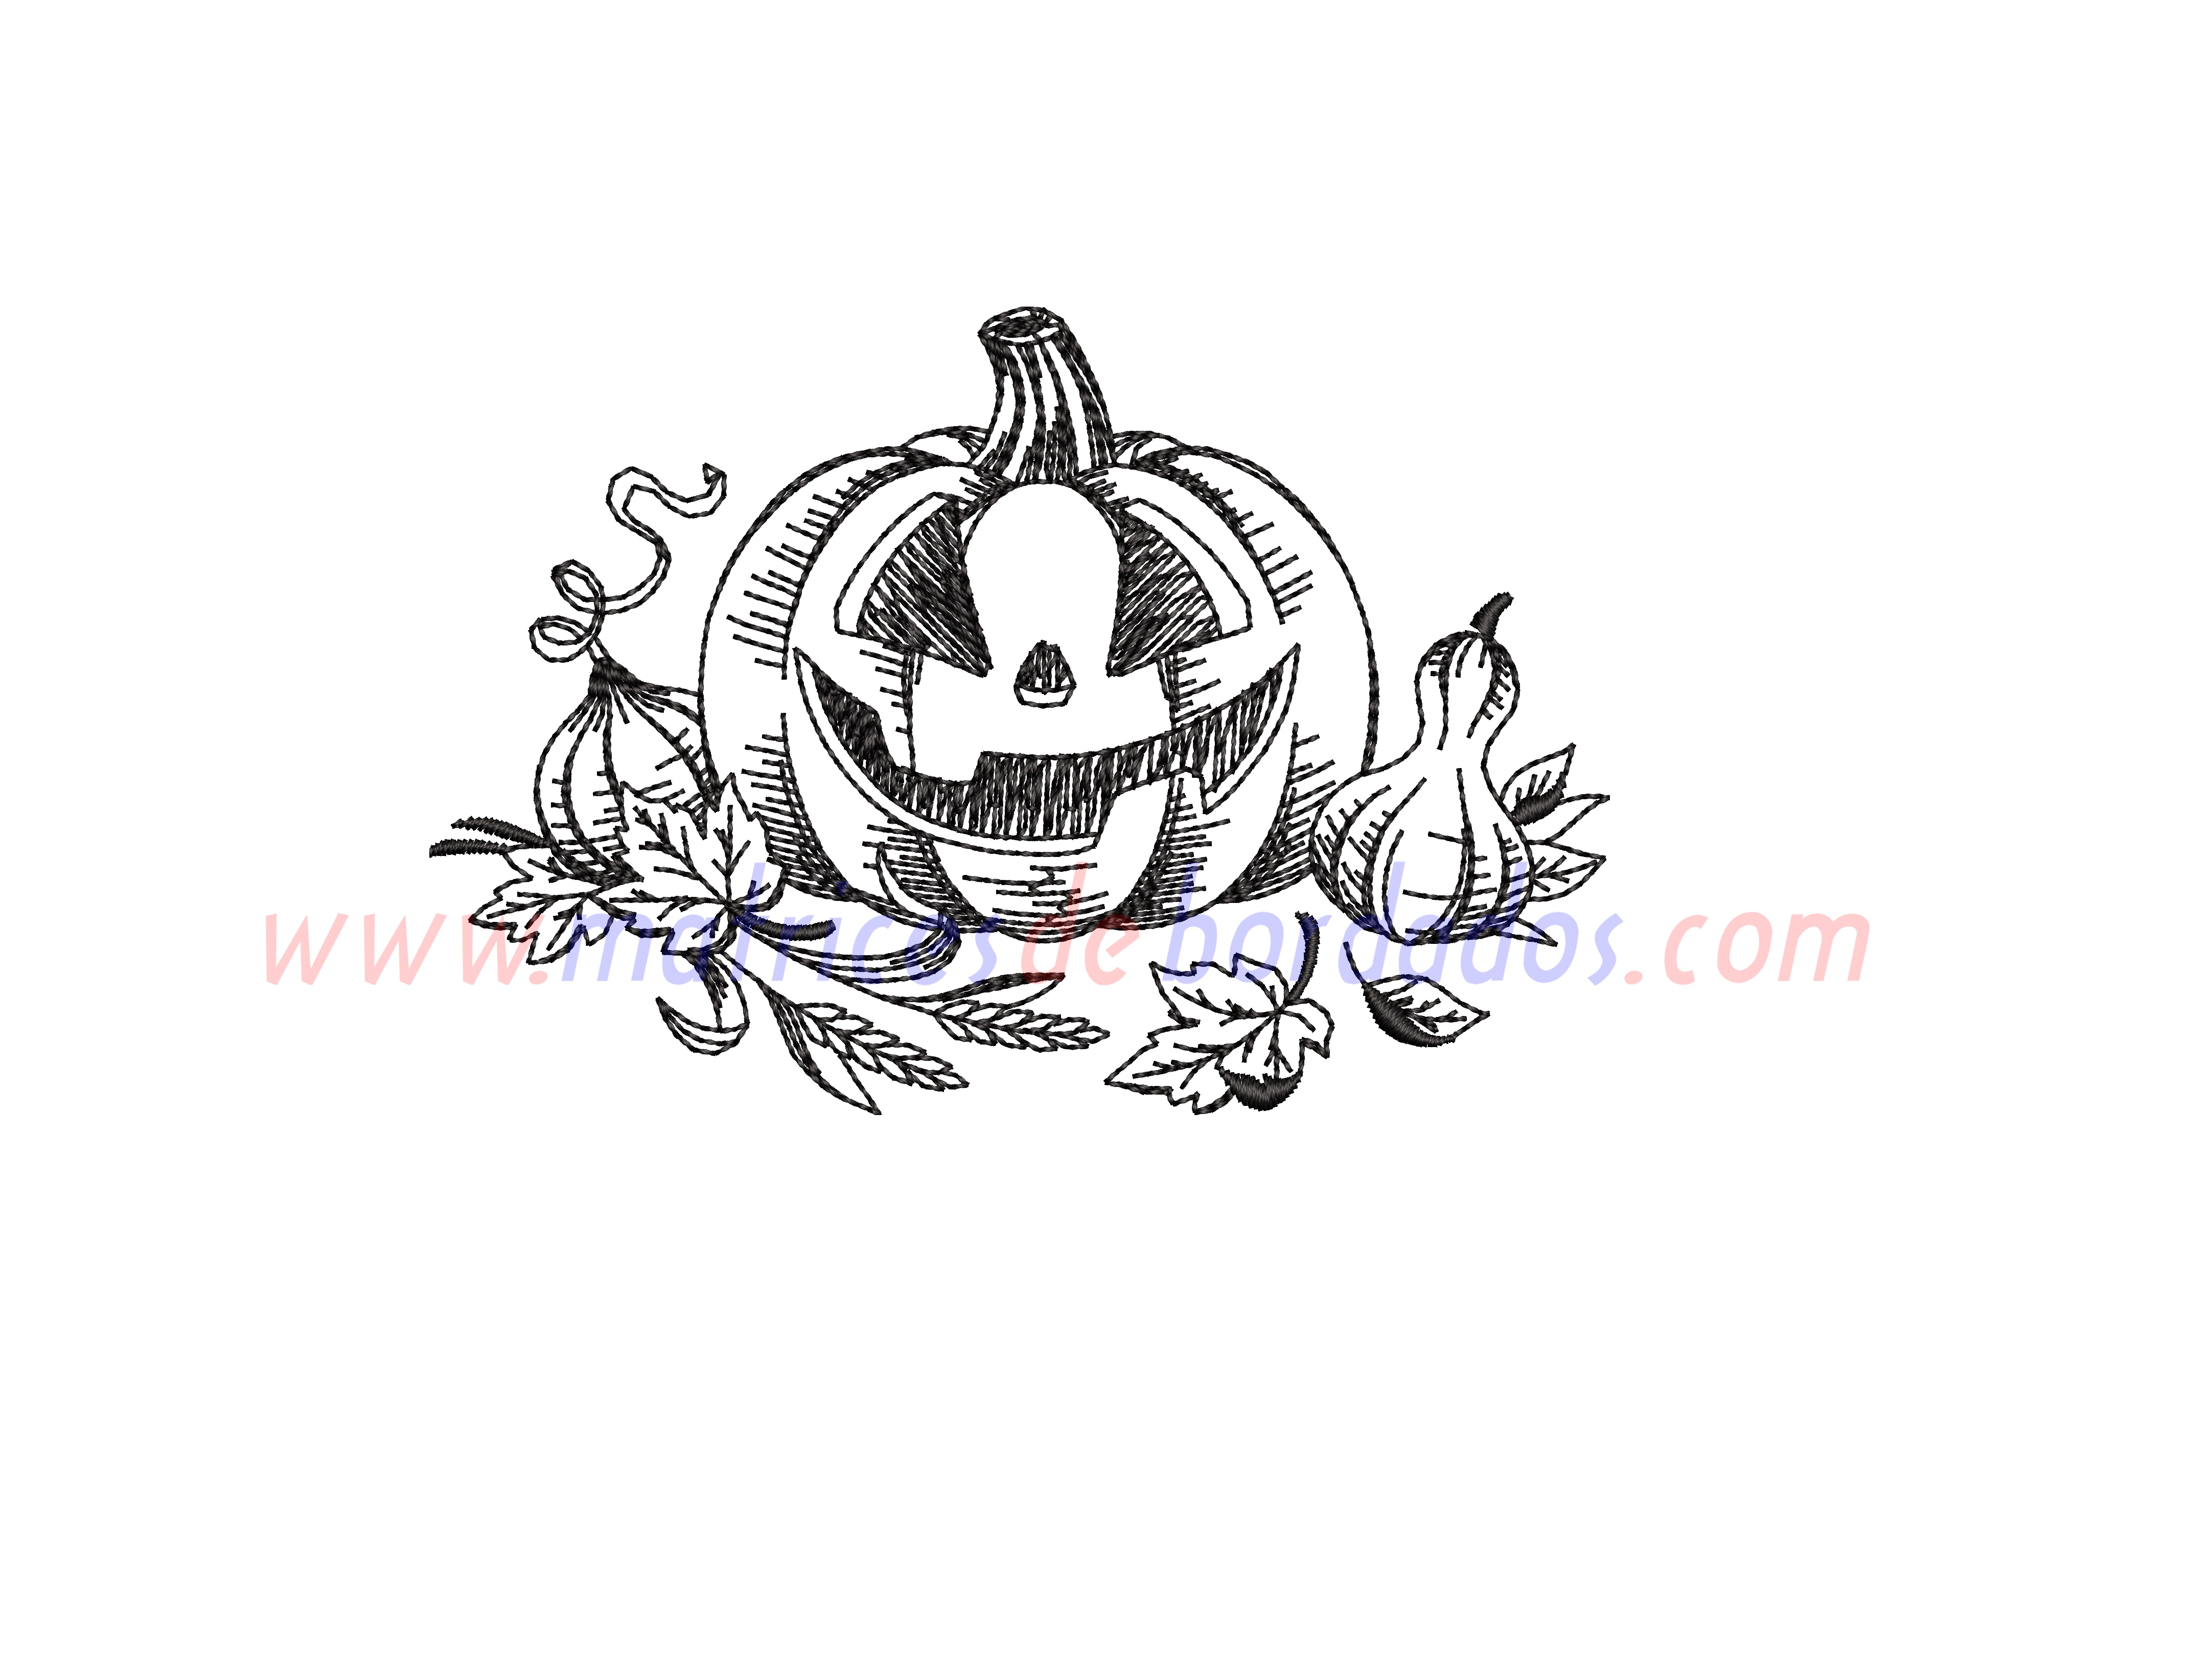 NL14VS - Calabaza en bordado lineal para Halloween